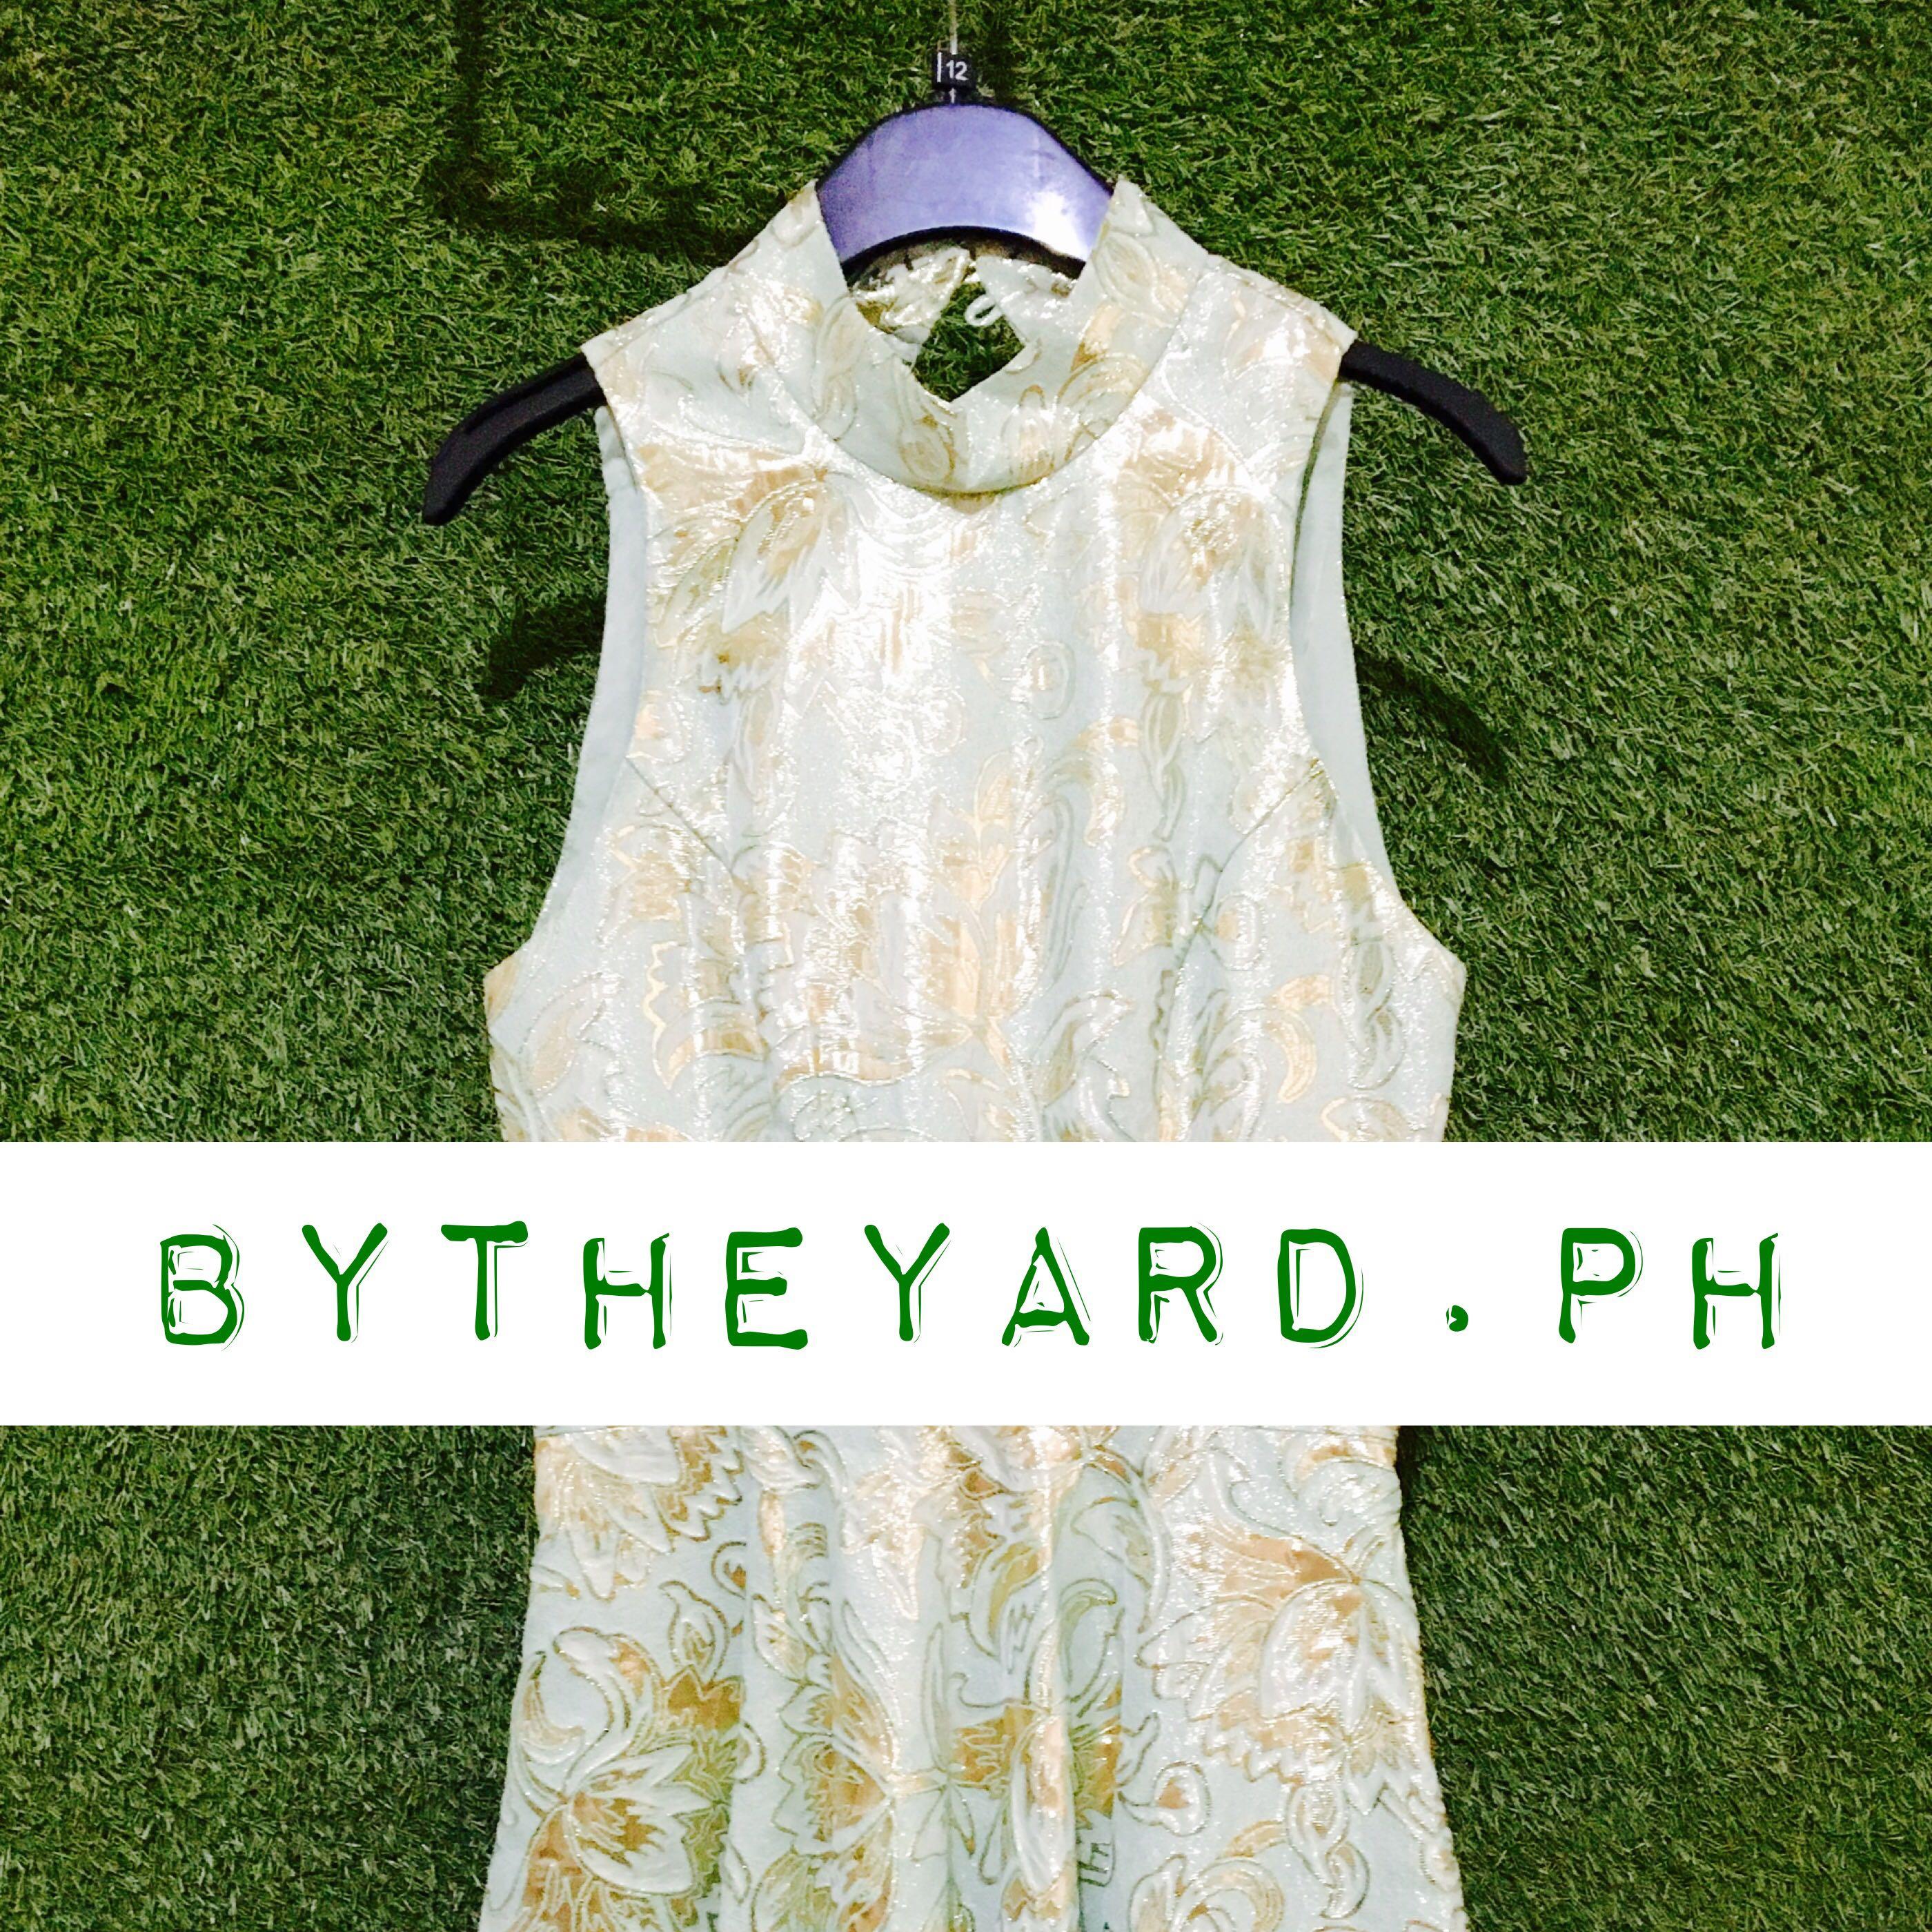 bytheyard.ph